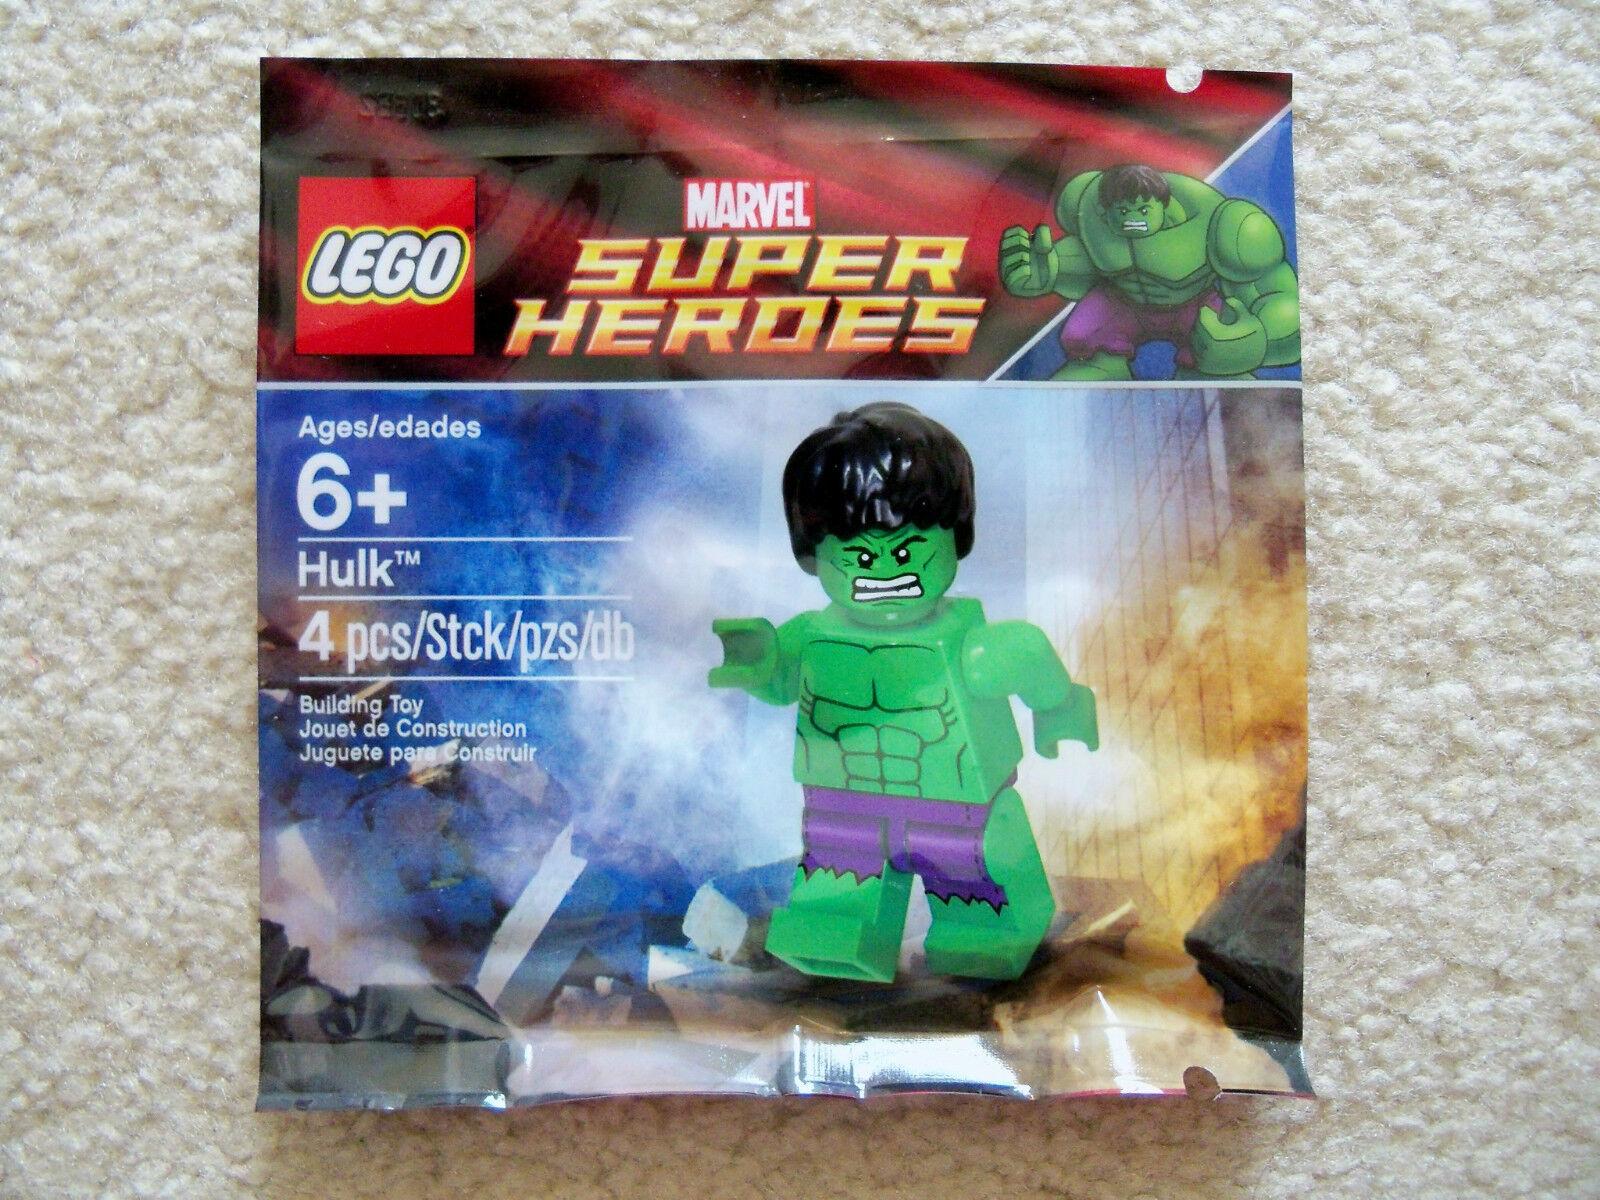 LEGO Marvel Super Heroes - Super Rare Promo Promo Promo Minifig - Hulk 5000022 - New 236f22